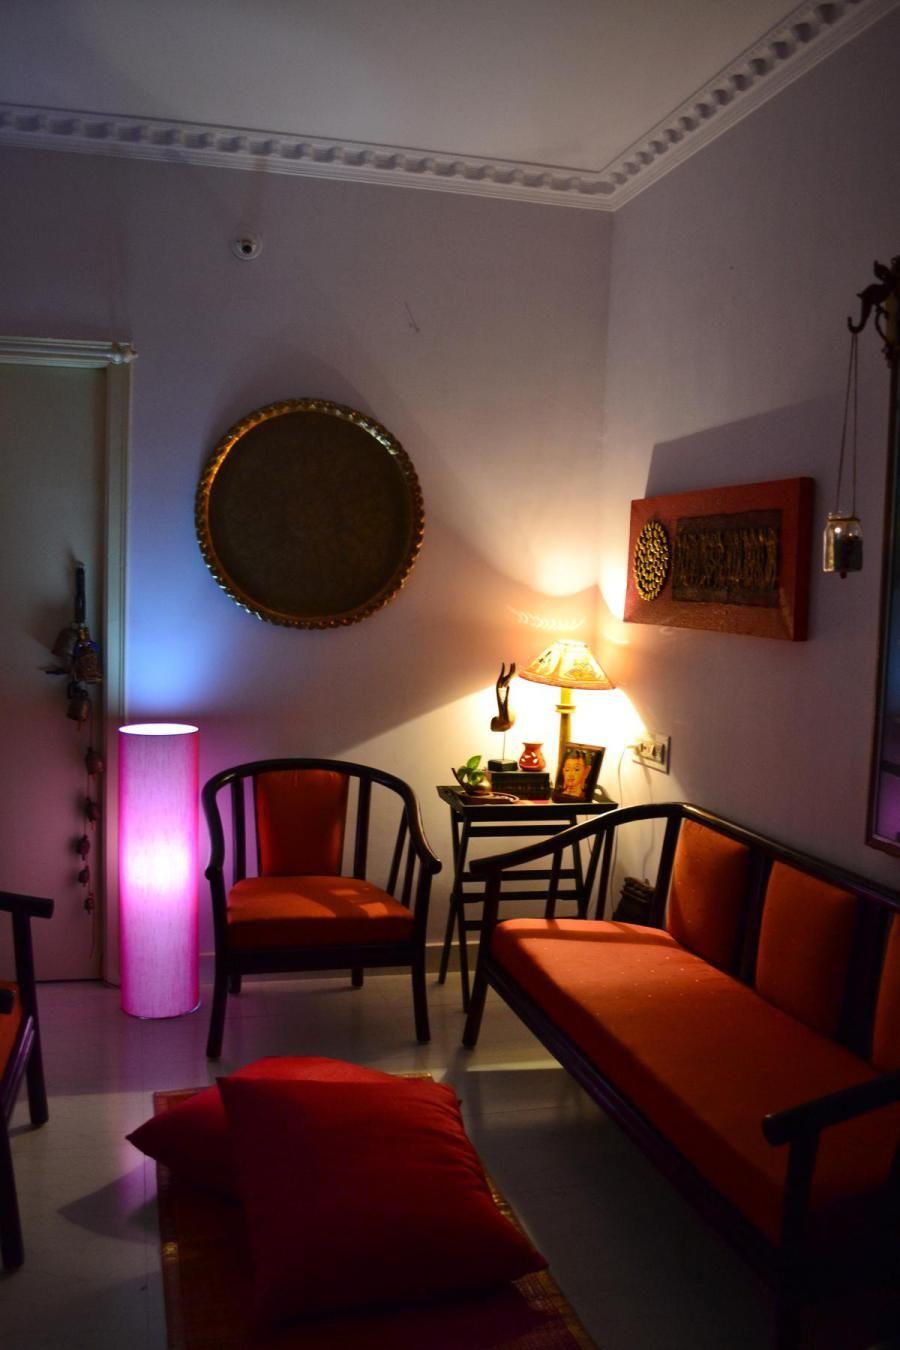 Drawing Room Sofa Designs India: A Flea Market Found Sofa Upholstered In Orange Silk Fabric